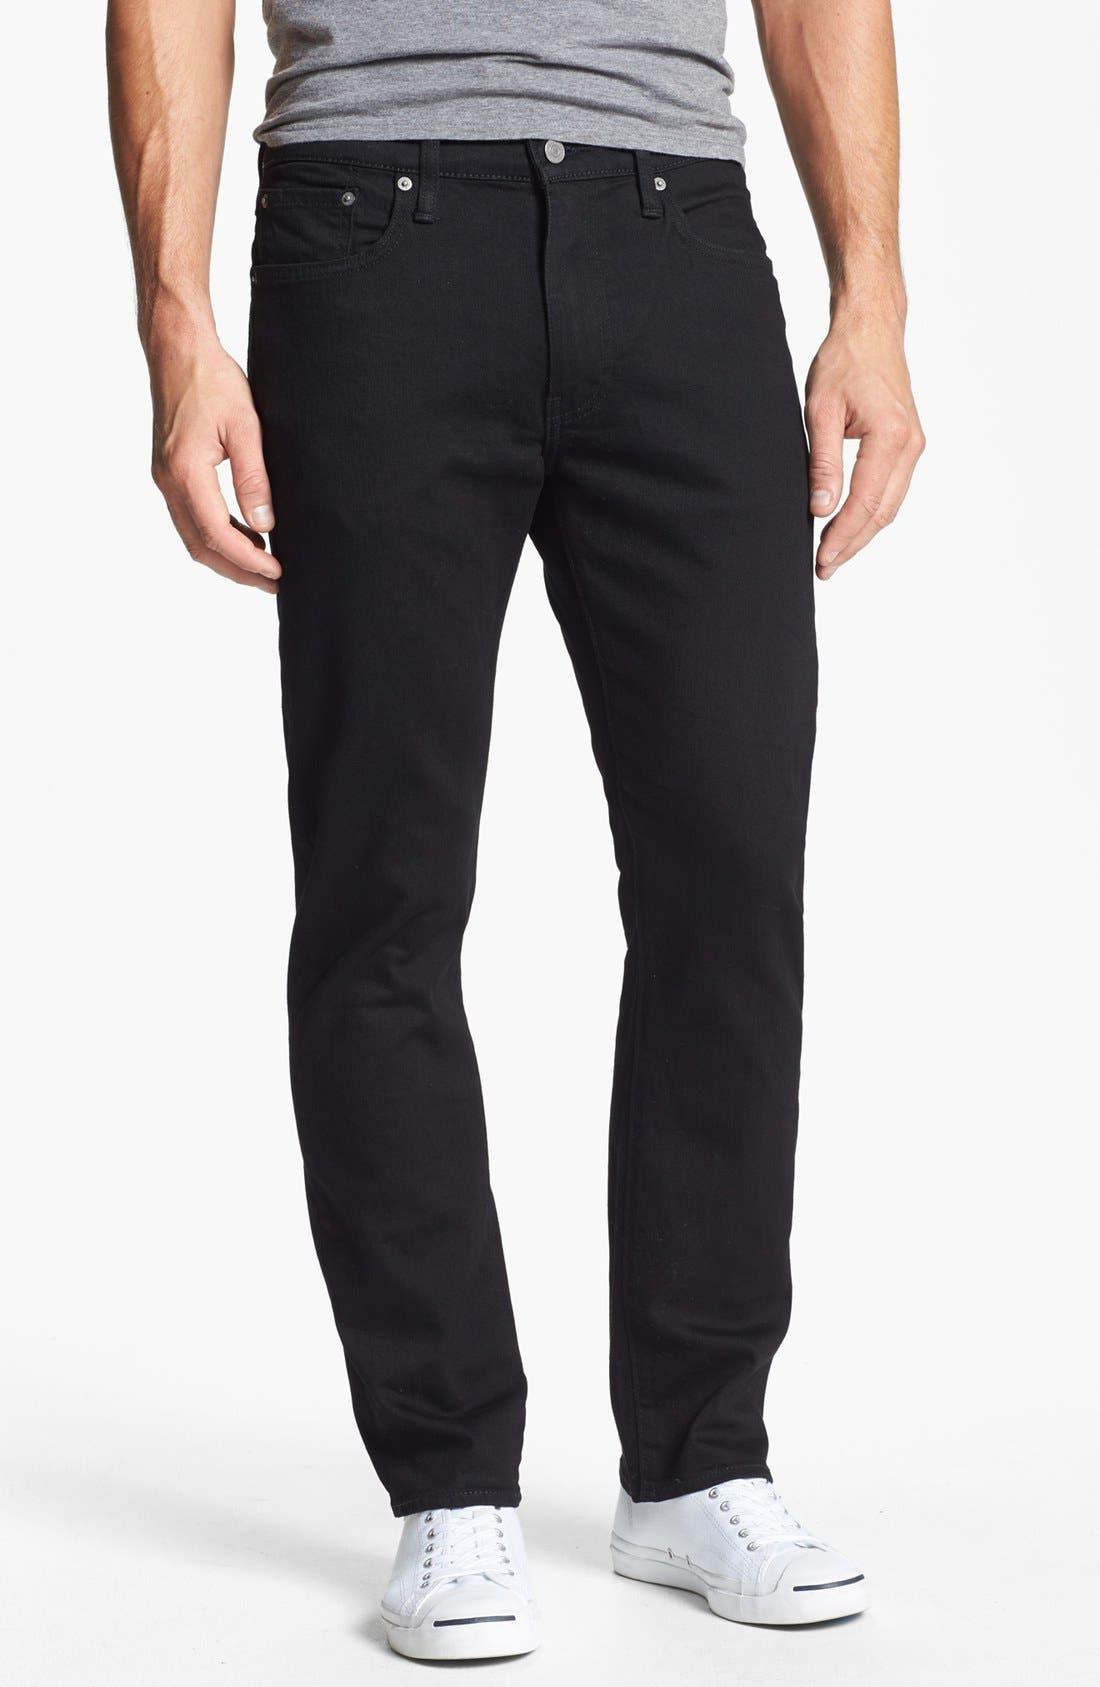 Main Image - Levi's® 513™ Slim Straight Leg Jeans (Nightshine)